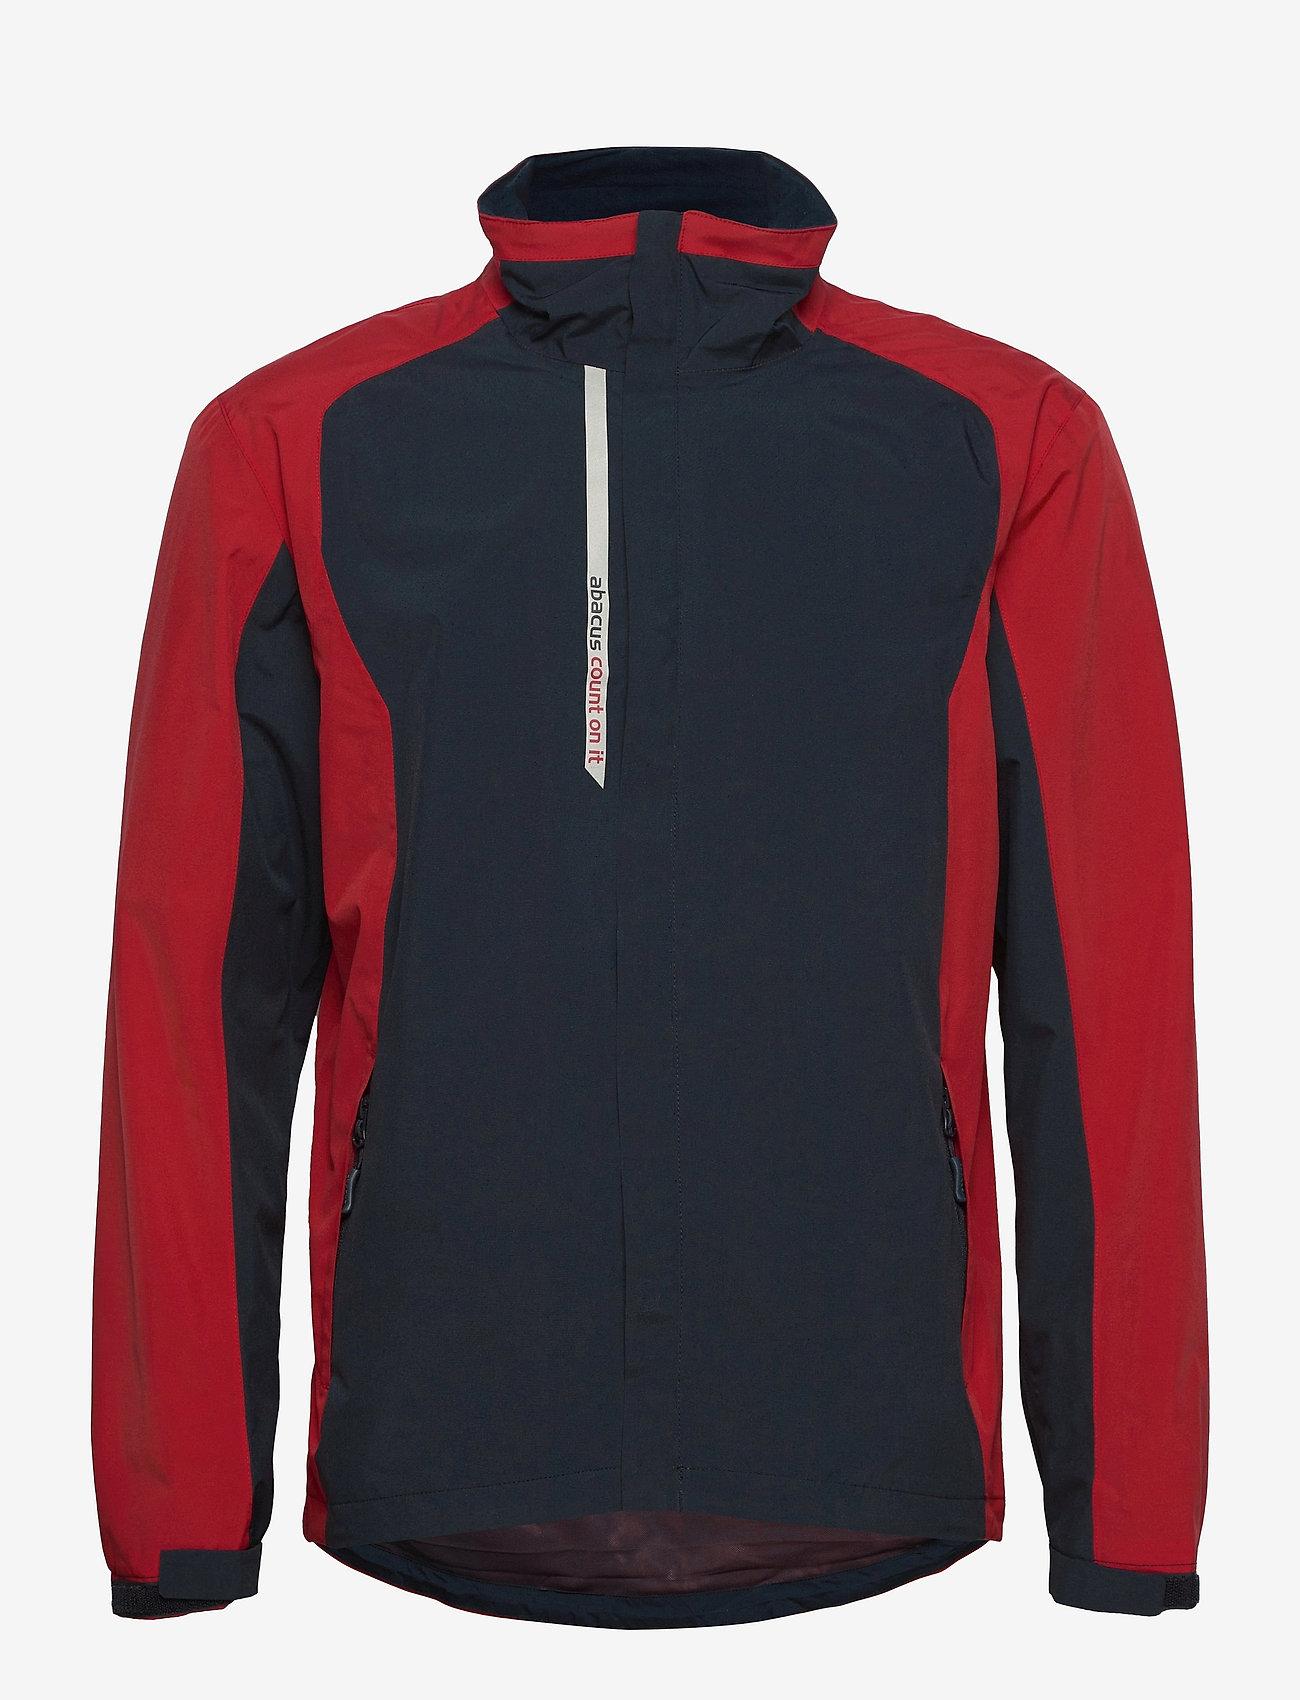 Abacus - Mens Links rainjacket - golf jackets - navy/red - 0